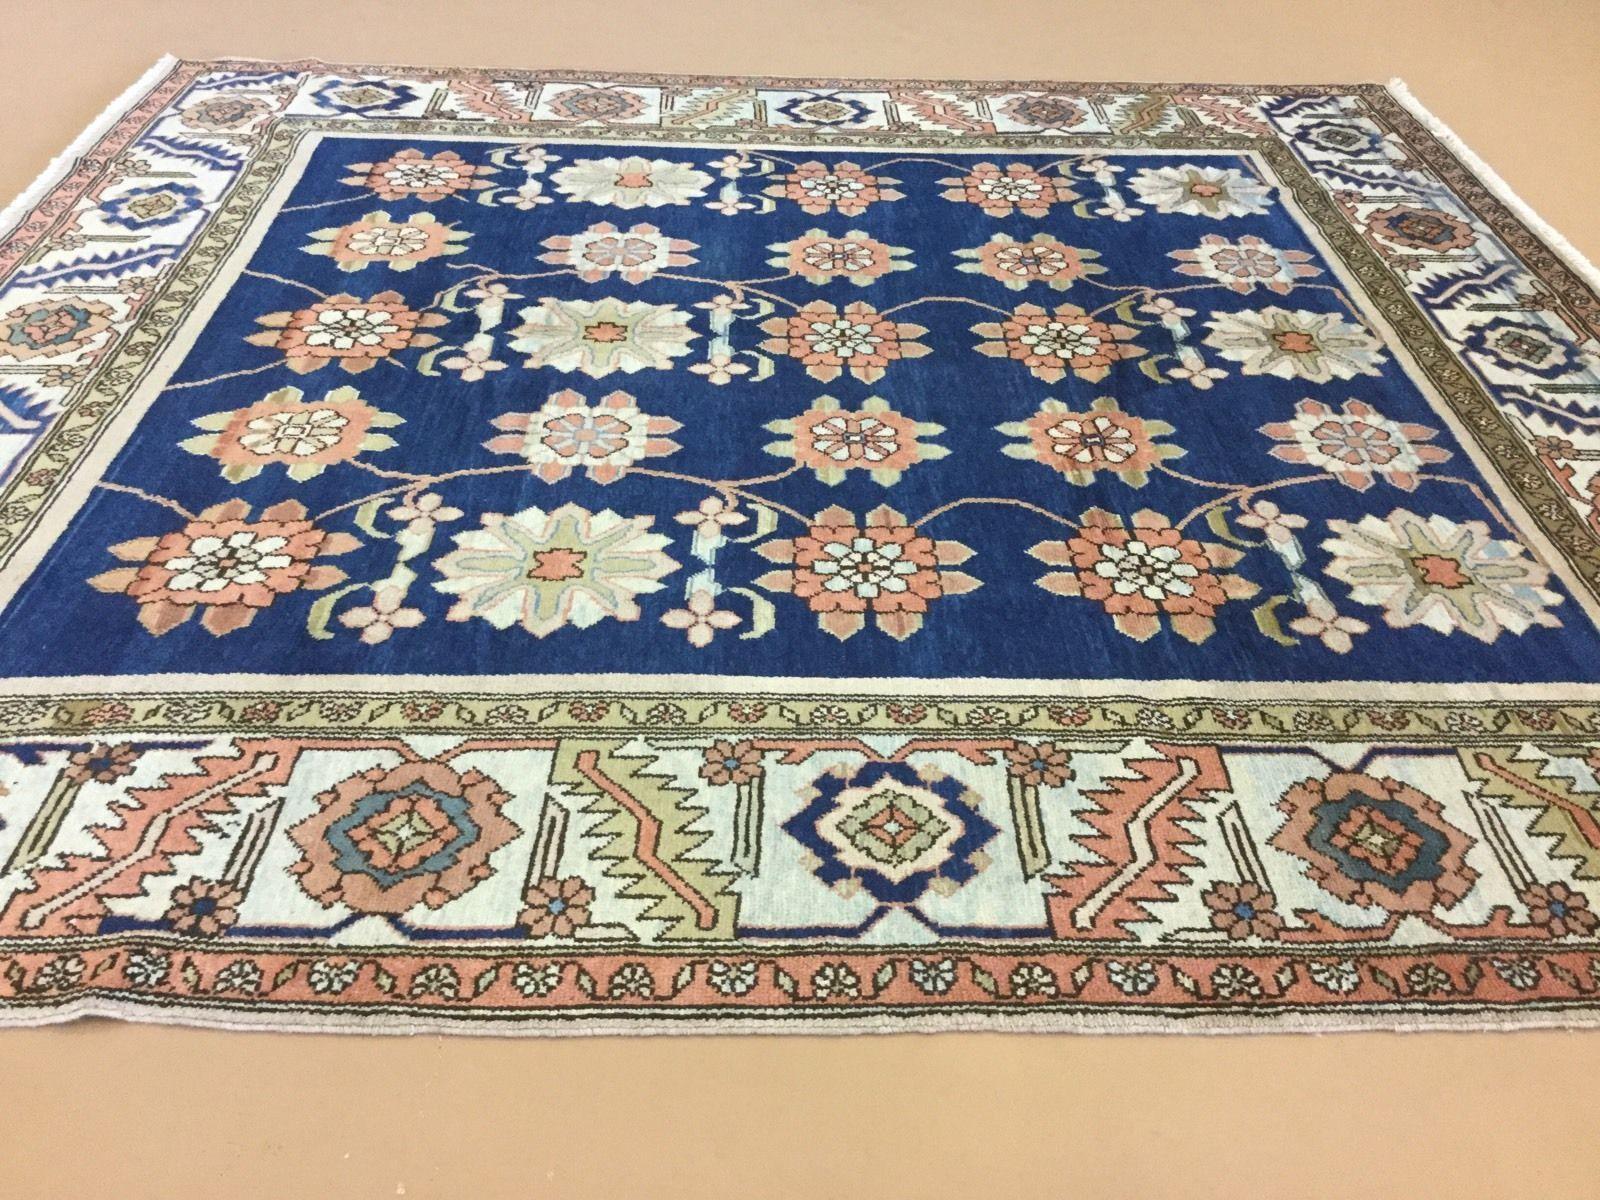 11 X 12 Square Semi Antique Persian Heri Z Persian Oriental Rug Wool Ebay Oriental Persian Rugs Rugs Wool Rug